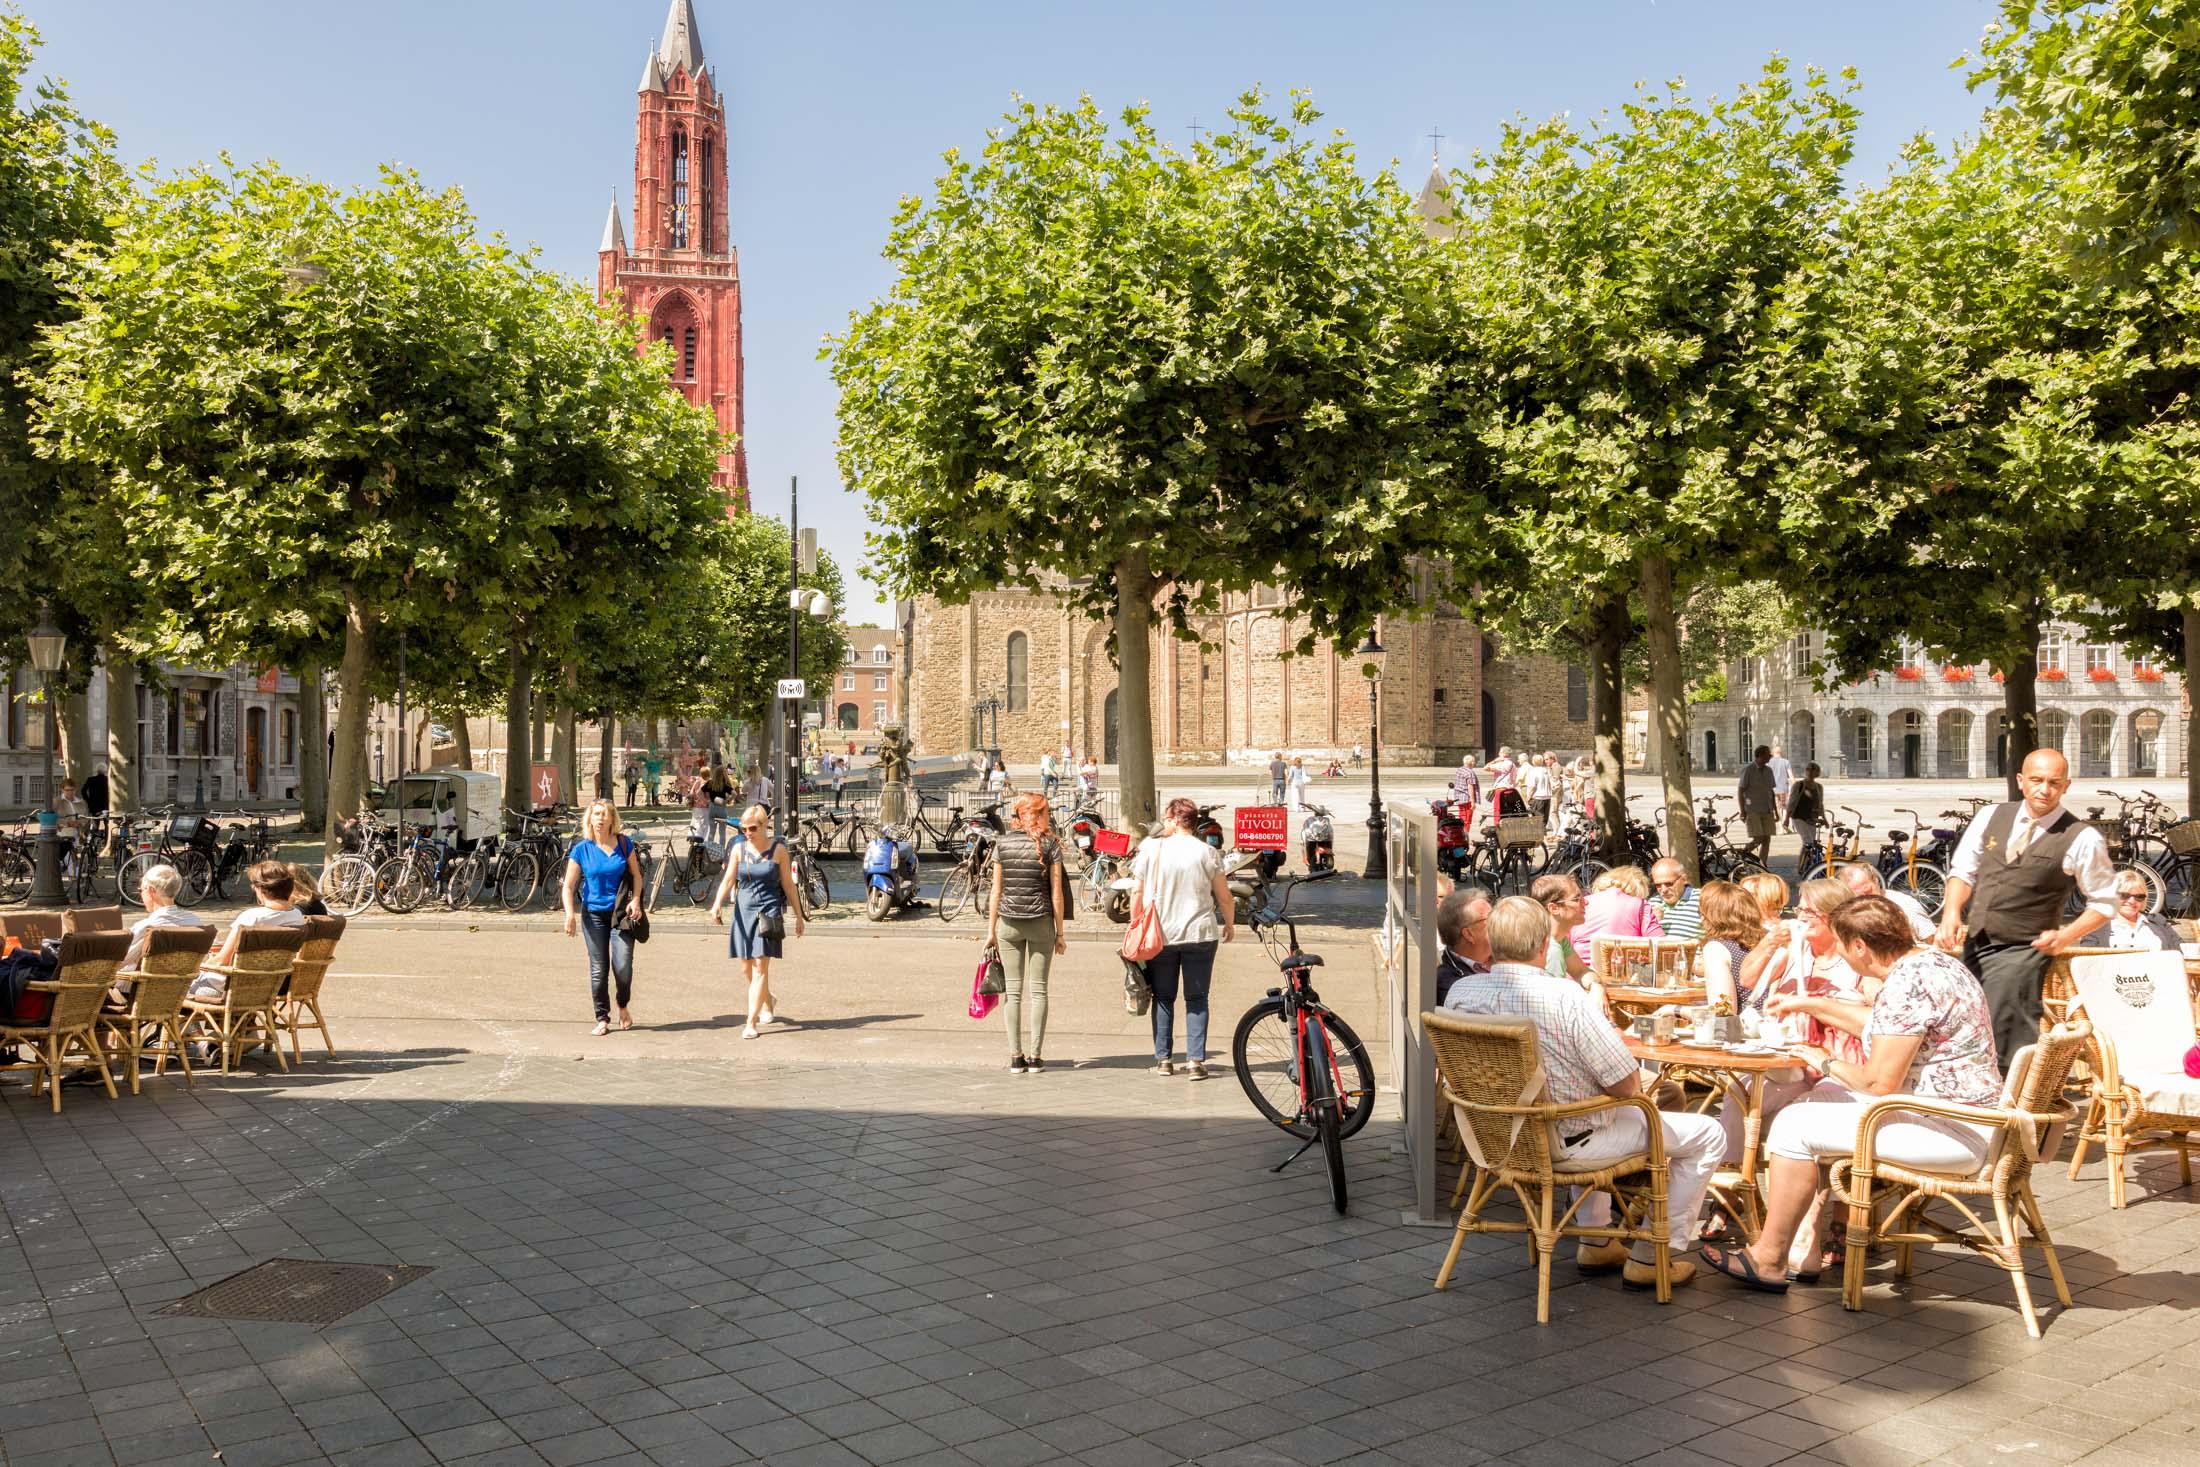 Maastricht-Vrijthof.jpg